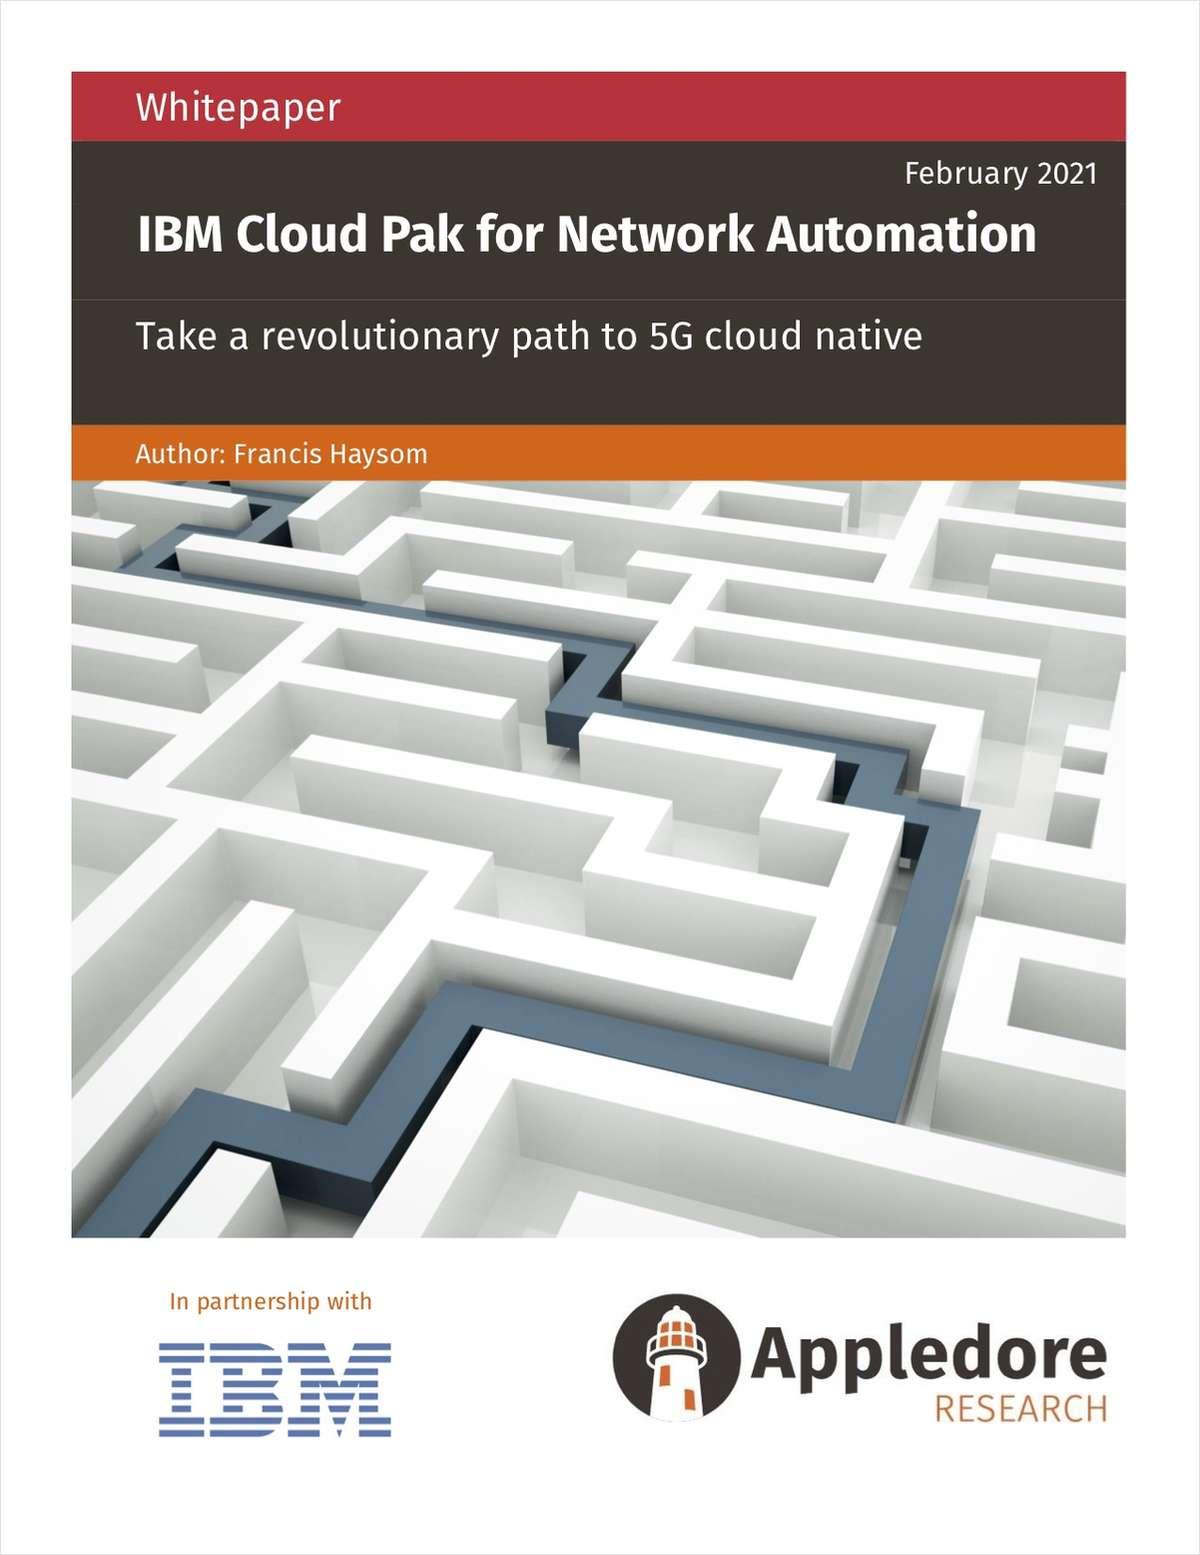 Take a revolutionary path to 5G cloud native (Appledore Whitepaper)